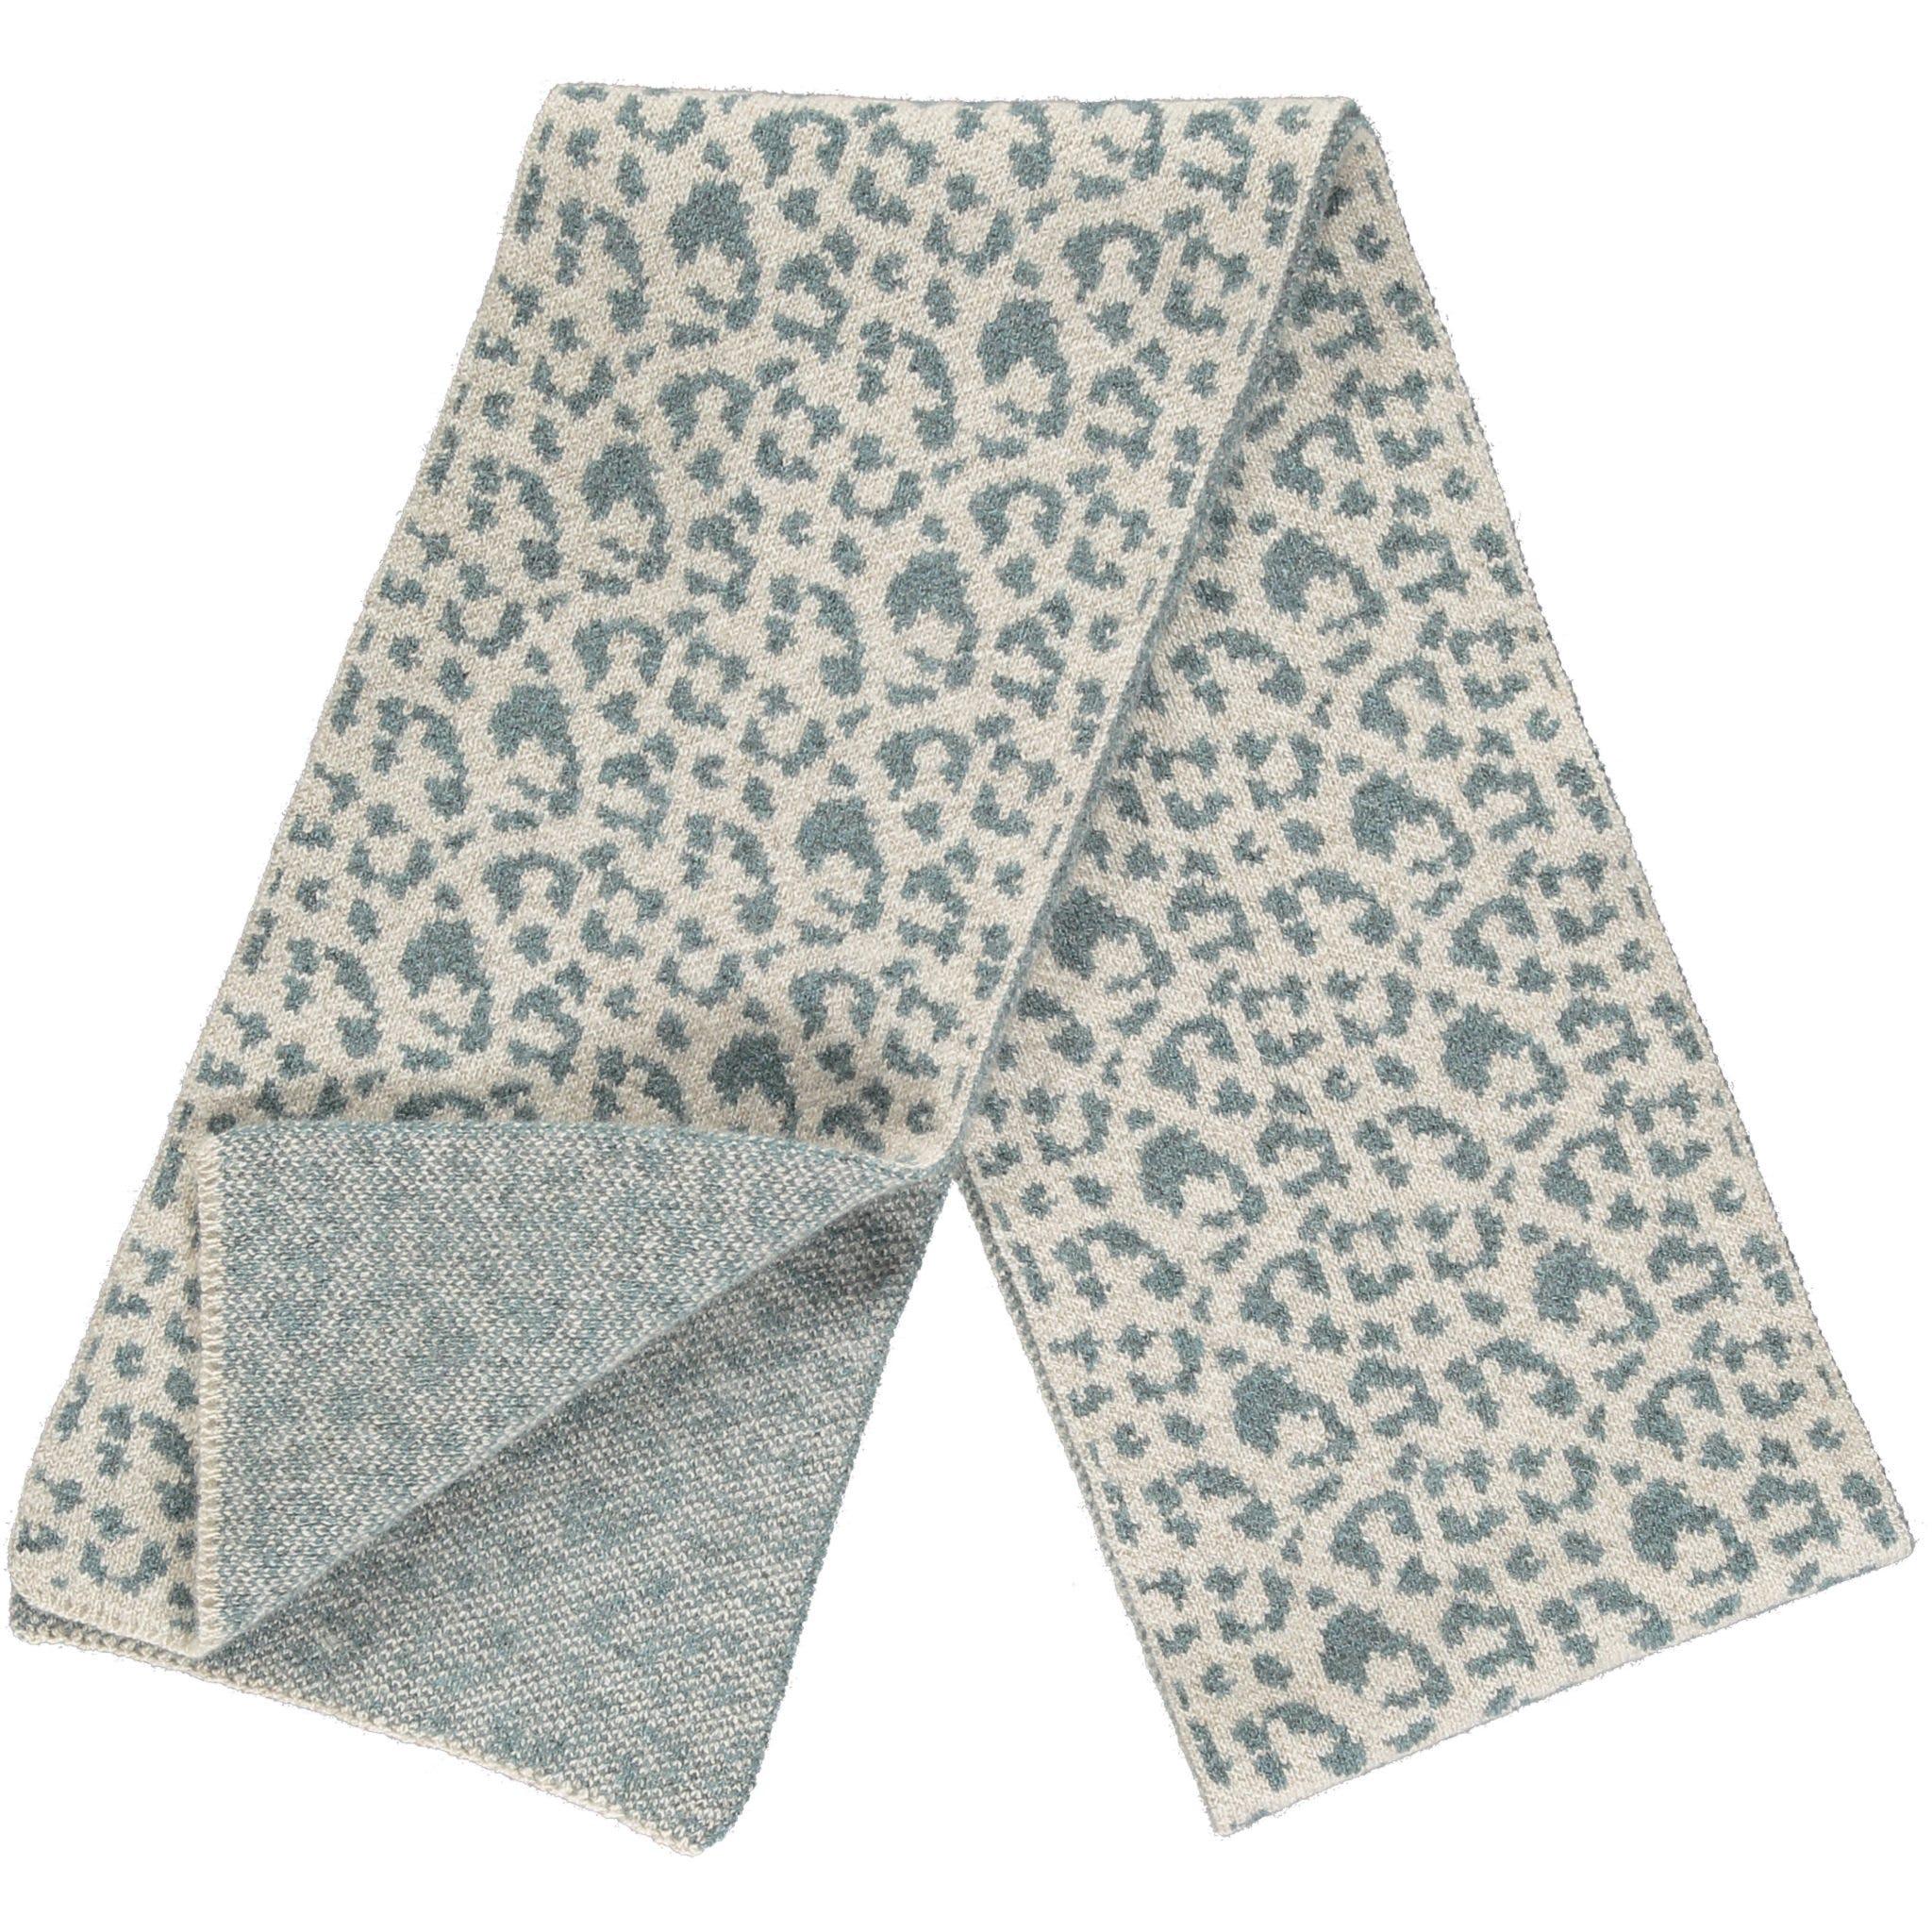 Leopard Design - Cream and Blue